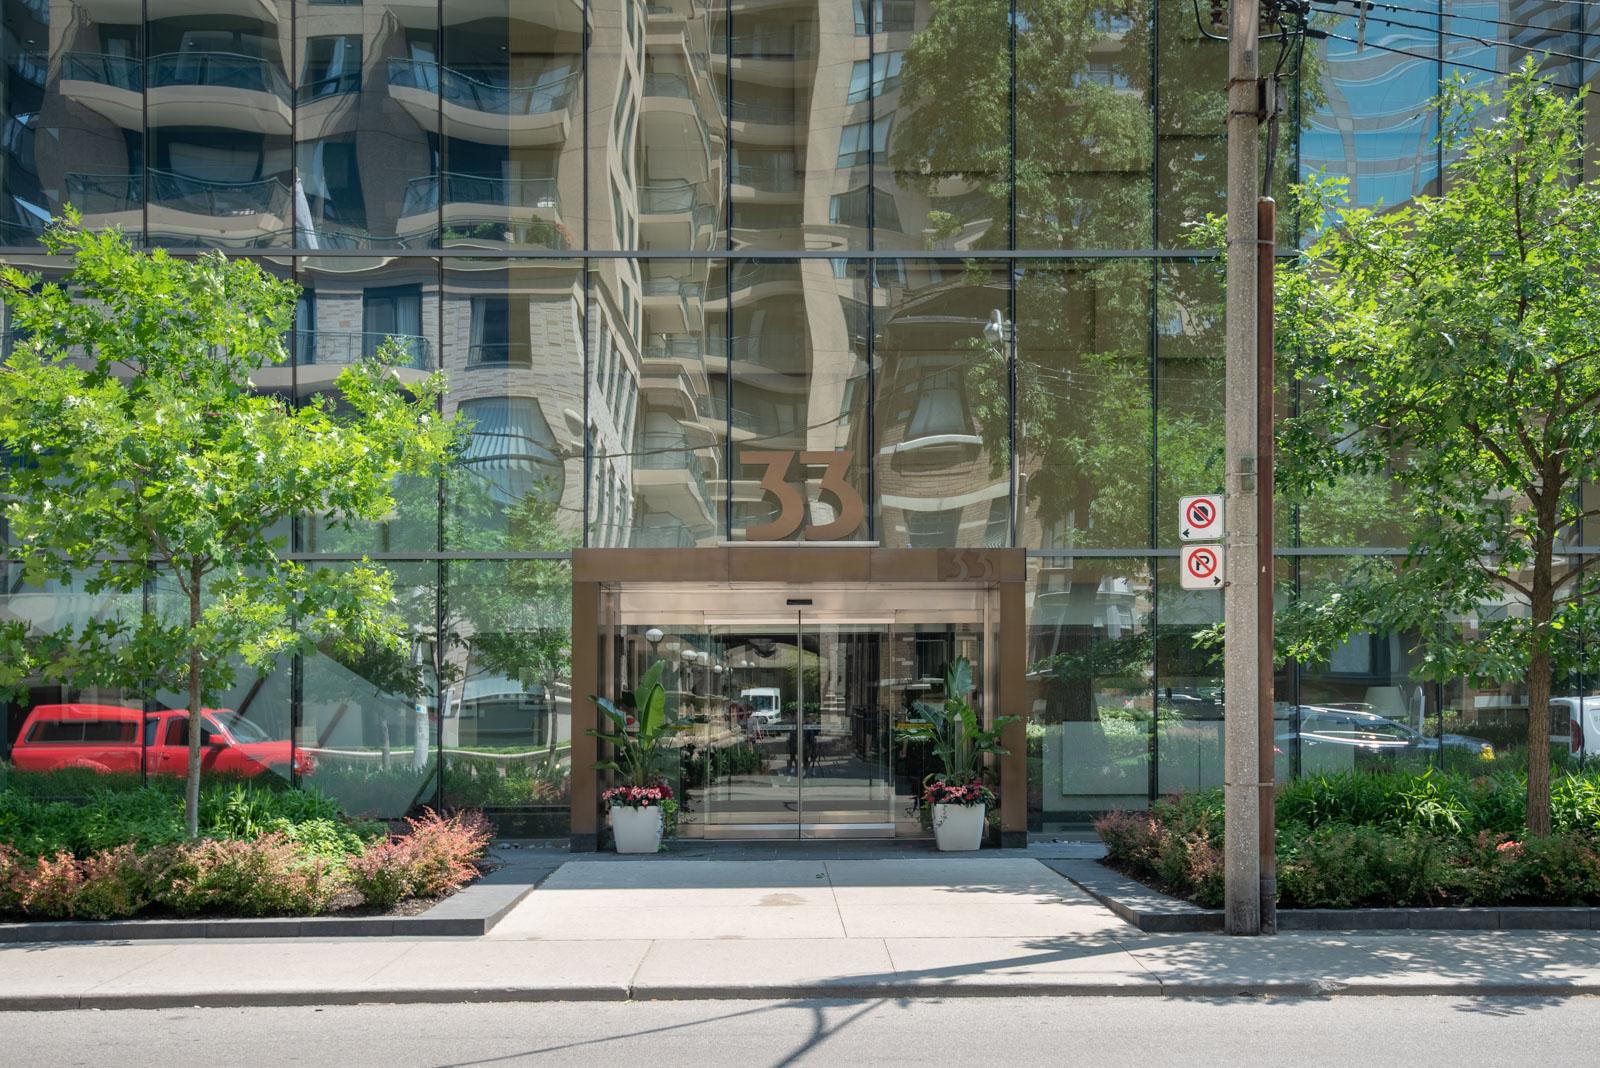 Casa Condos entrance